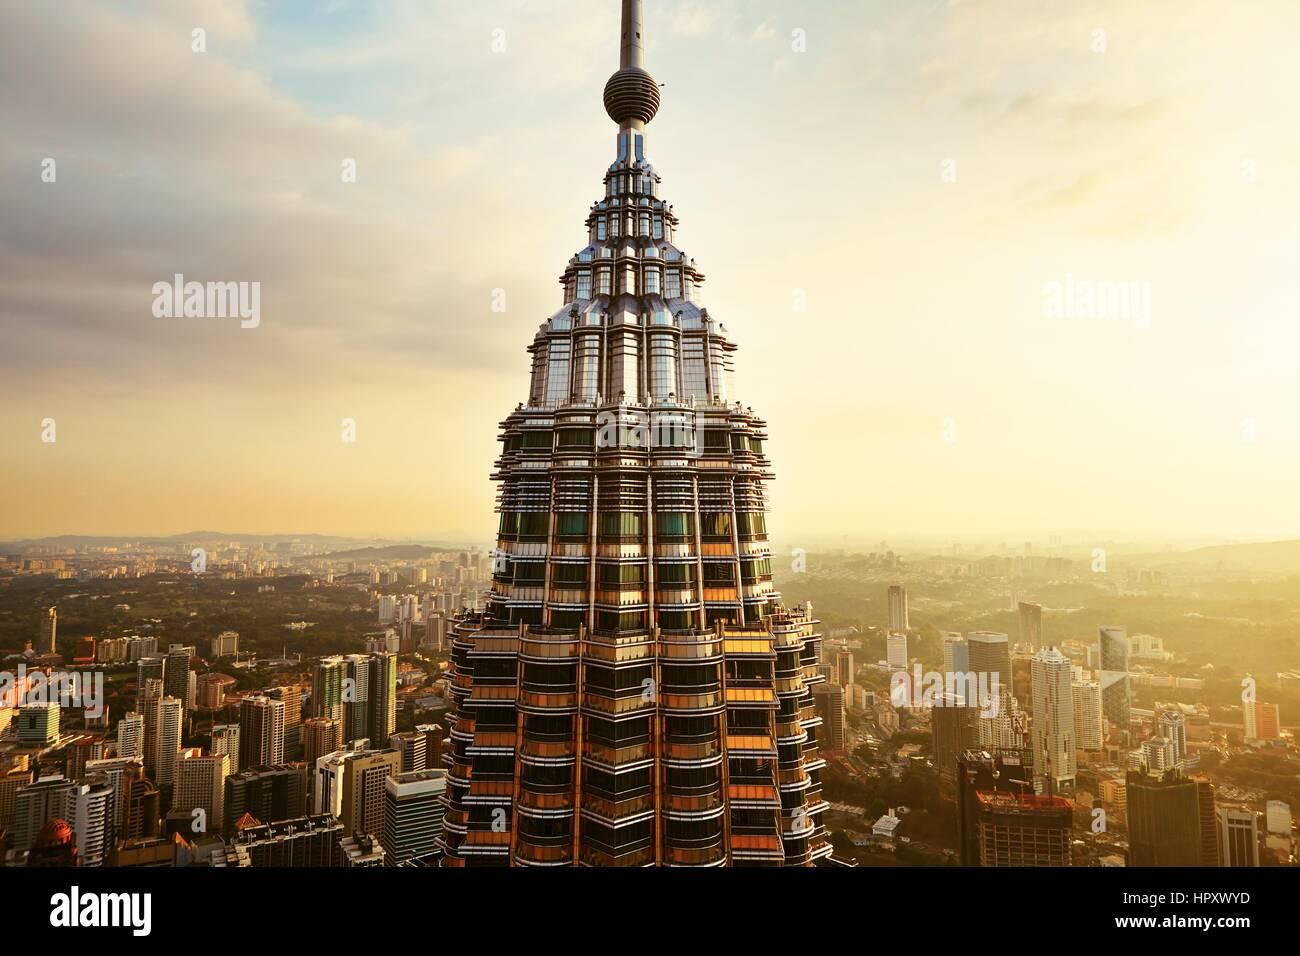 KUALA LUMPUR, MALAYSIA - APRIL 25: Blick von der Spitze des Petronas Twin Towers am 25. April 2014 in Kuala Lumpur, Stockbild